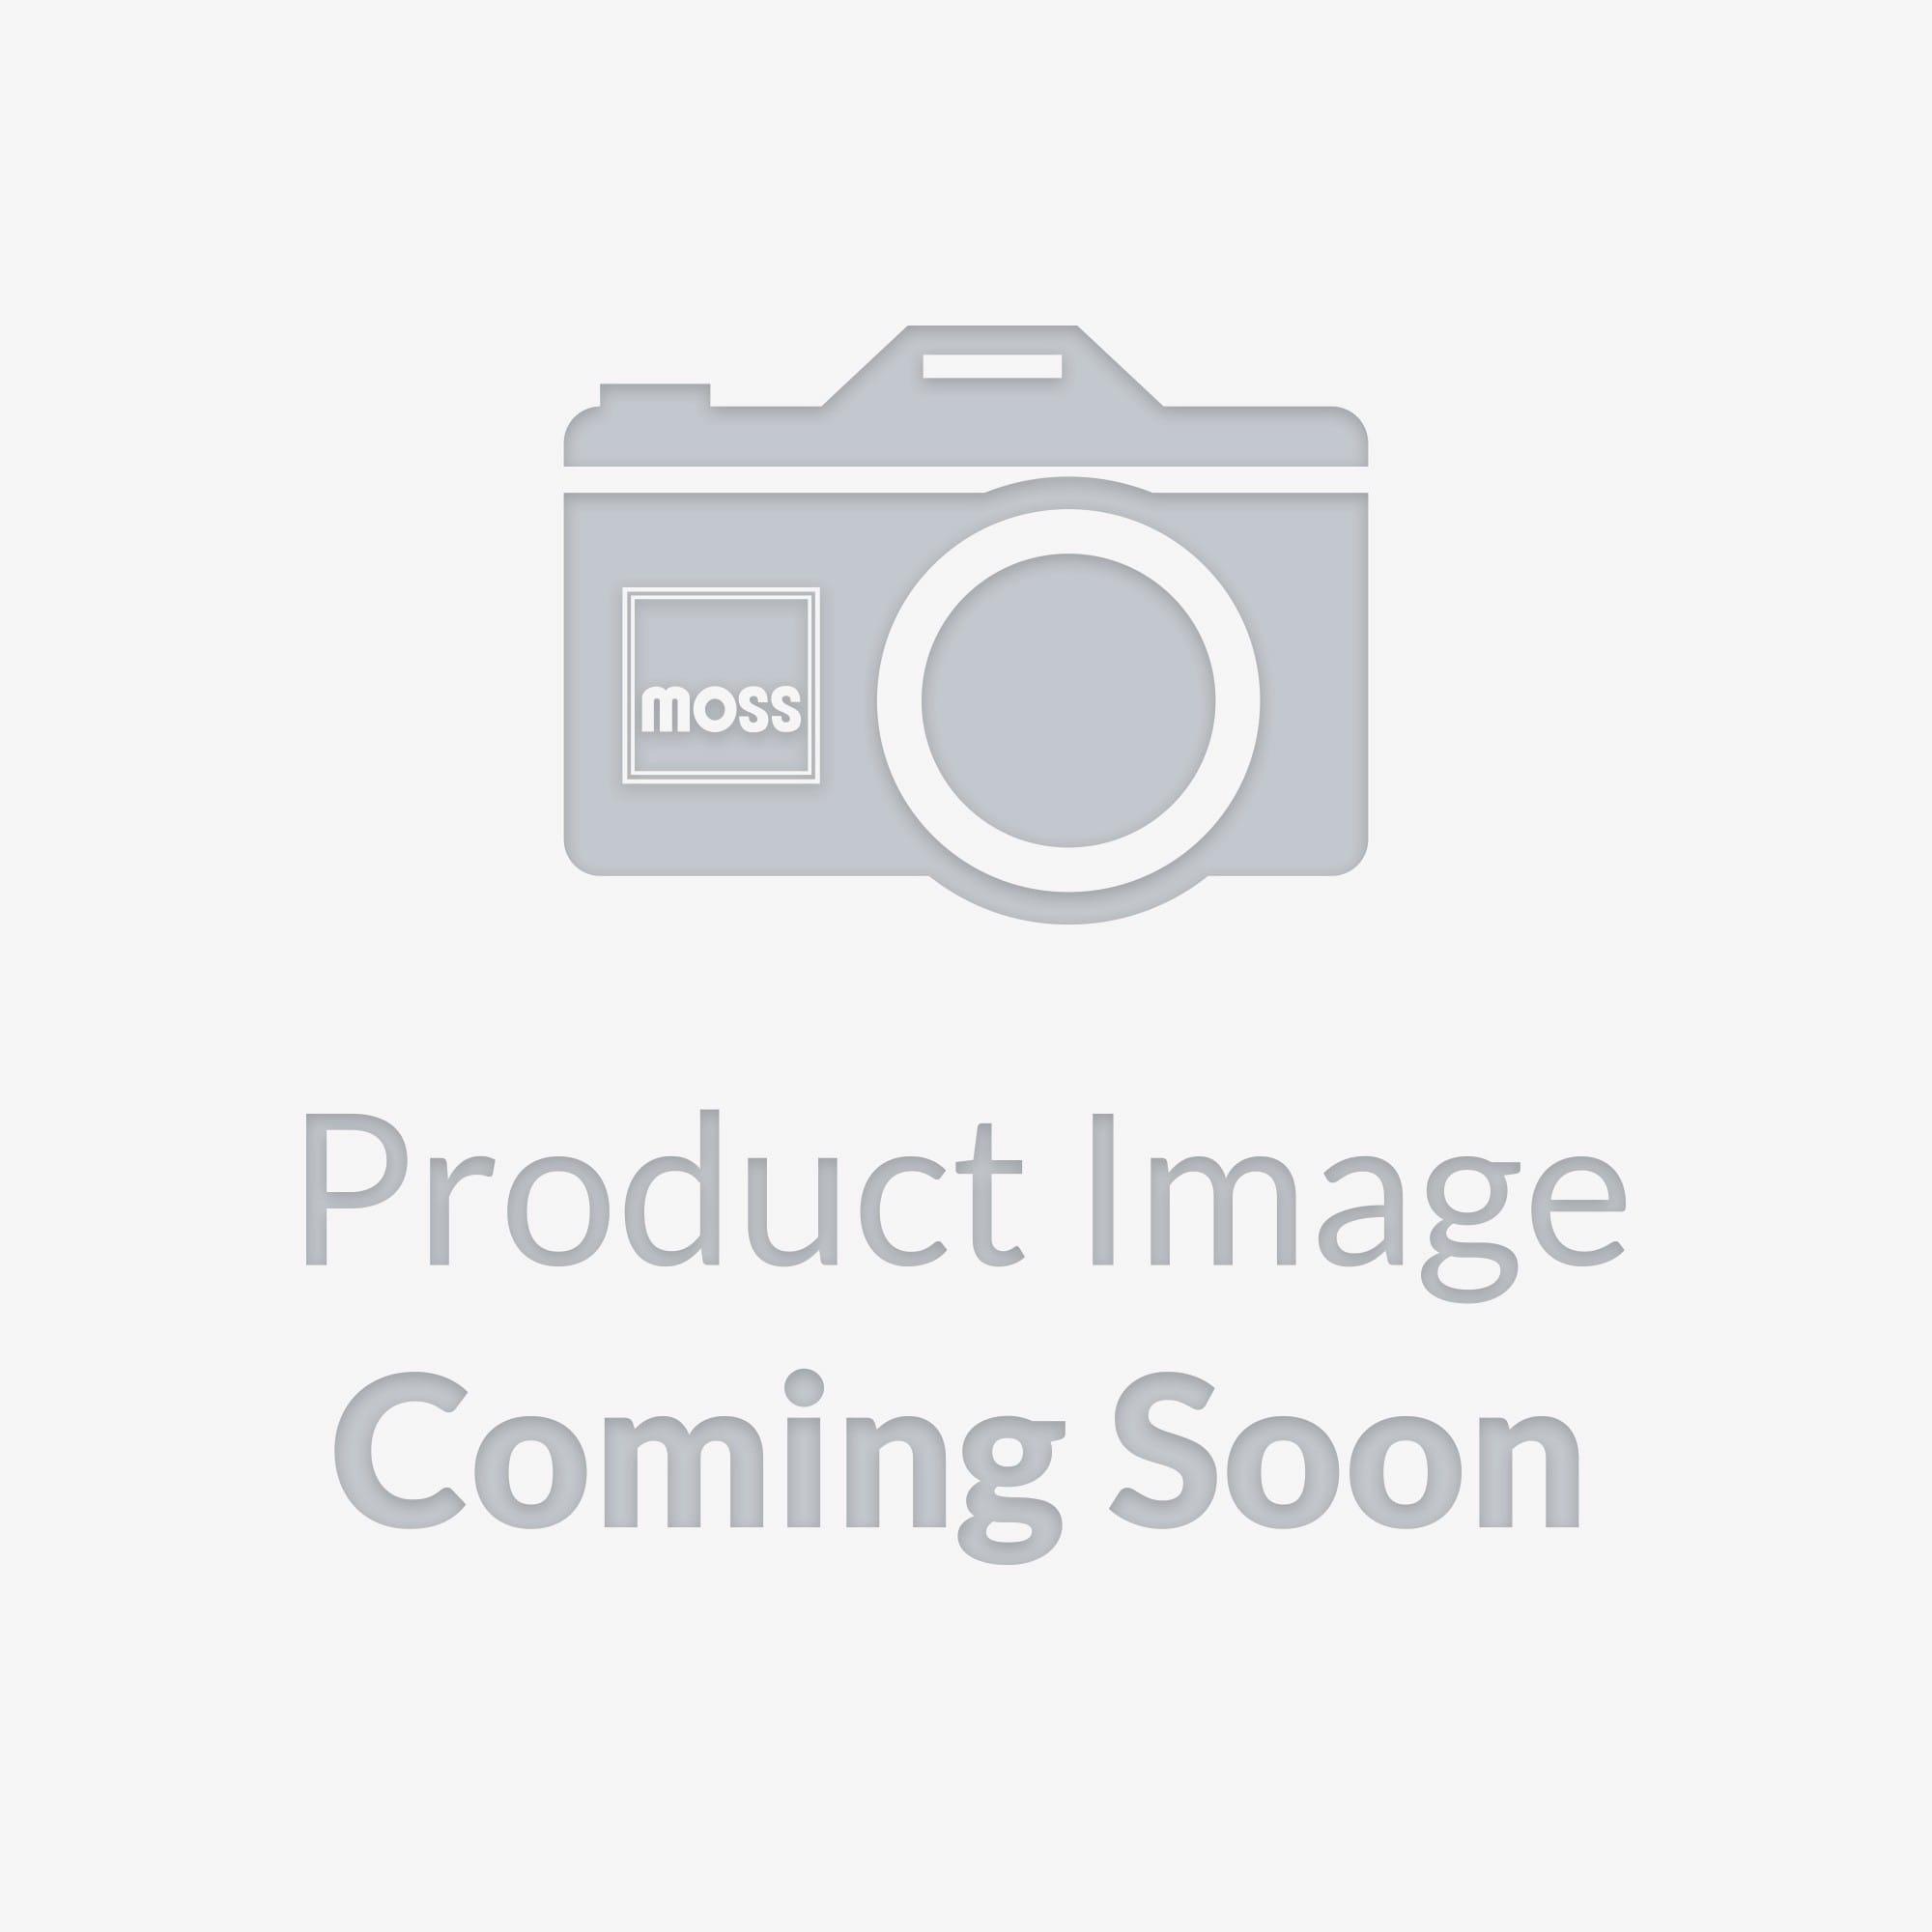 Model E 100 Also Ignition Wiring Diagram On Lpg Kit Wiring Diagram